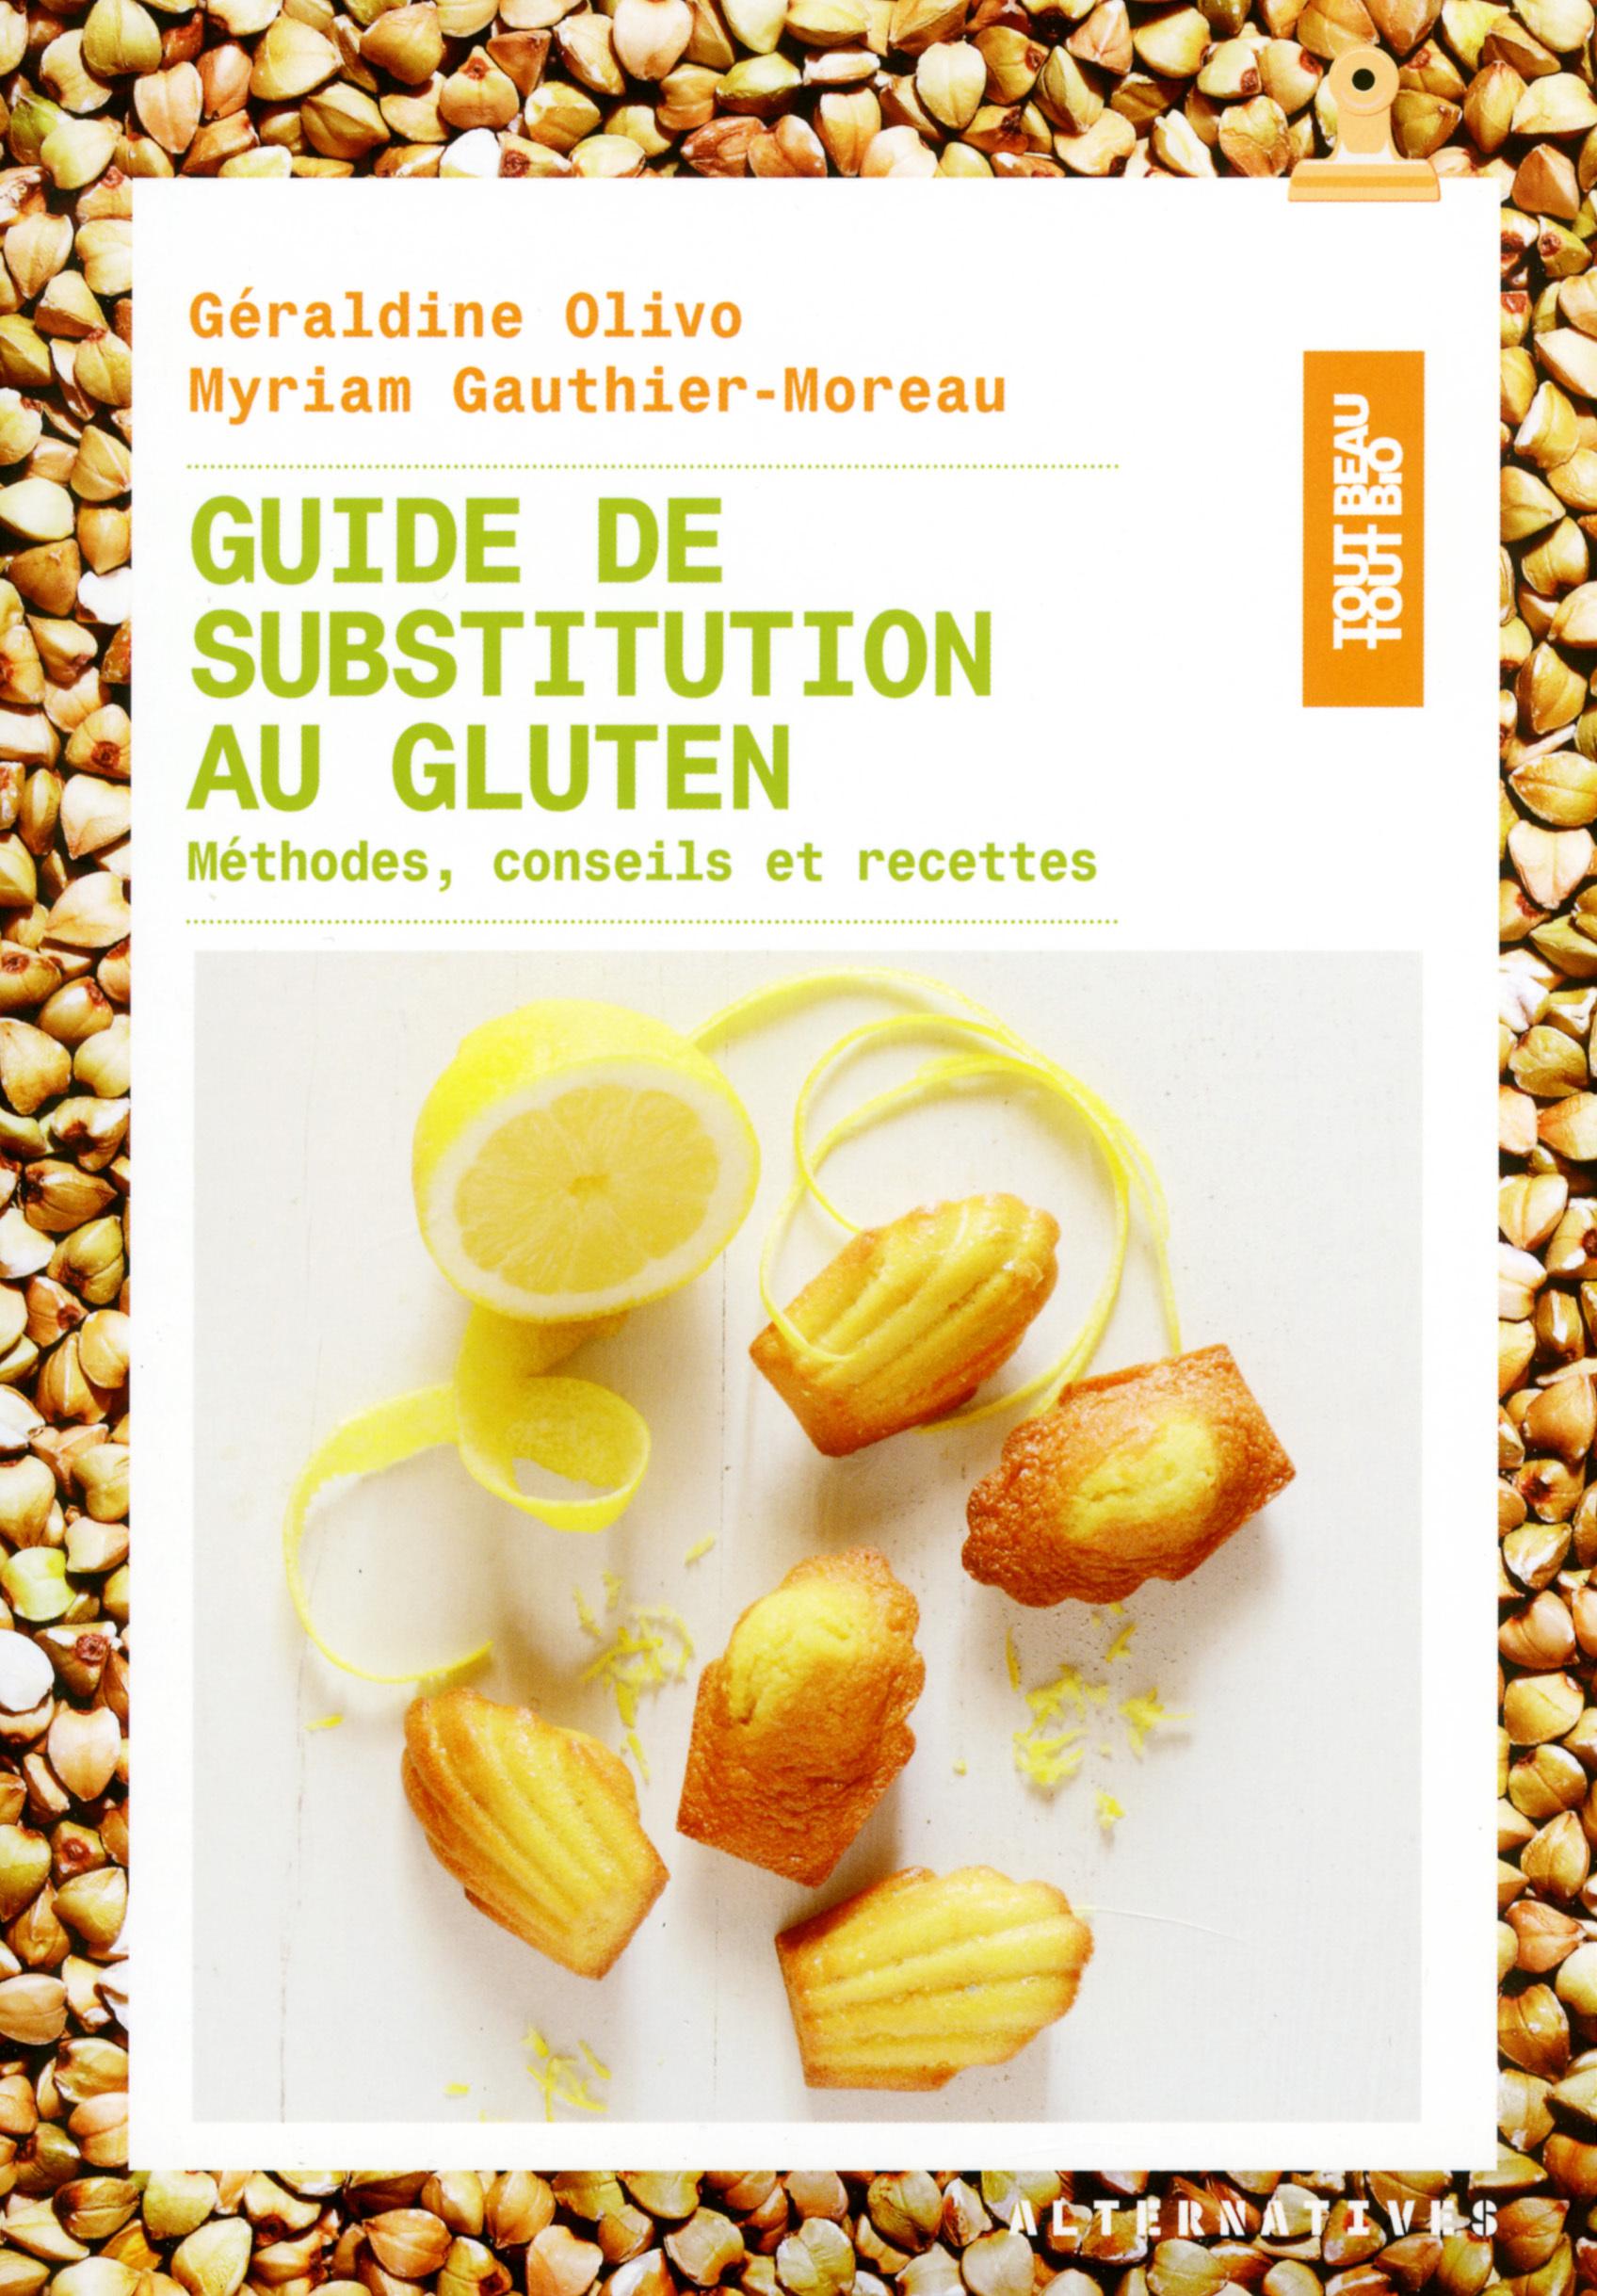 GUIDE DE SUBSTITUTION AU GLUTEN